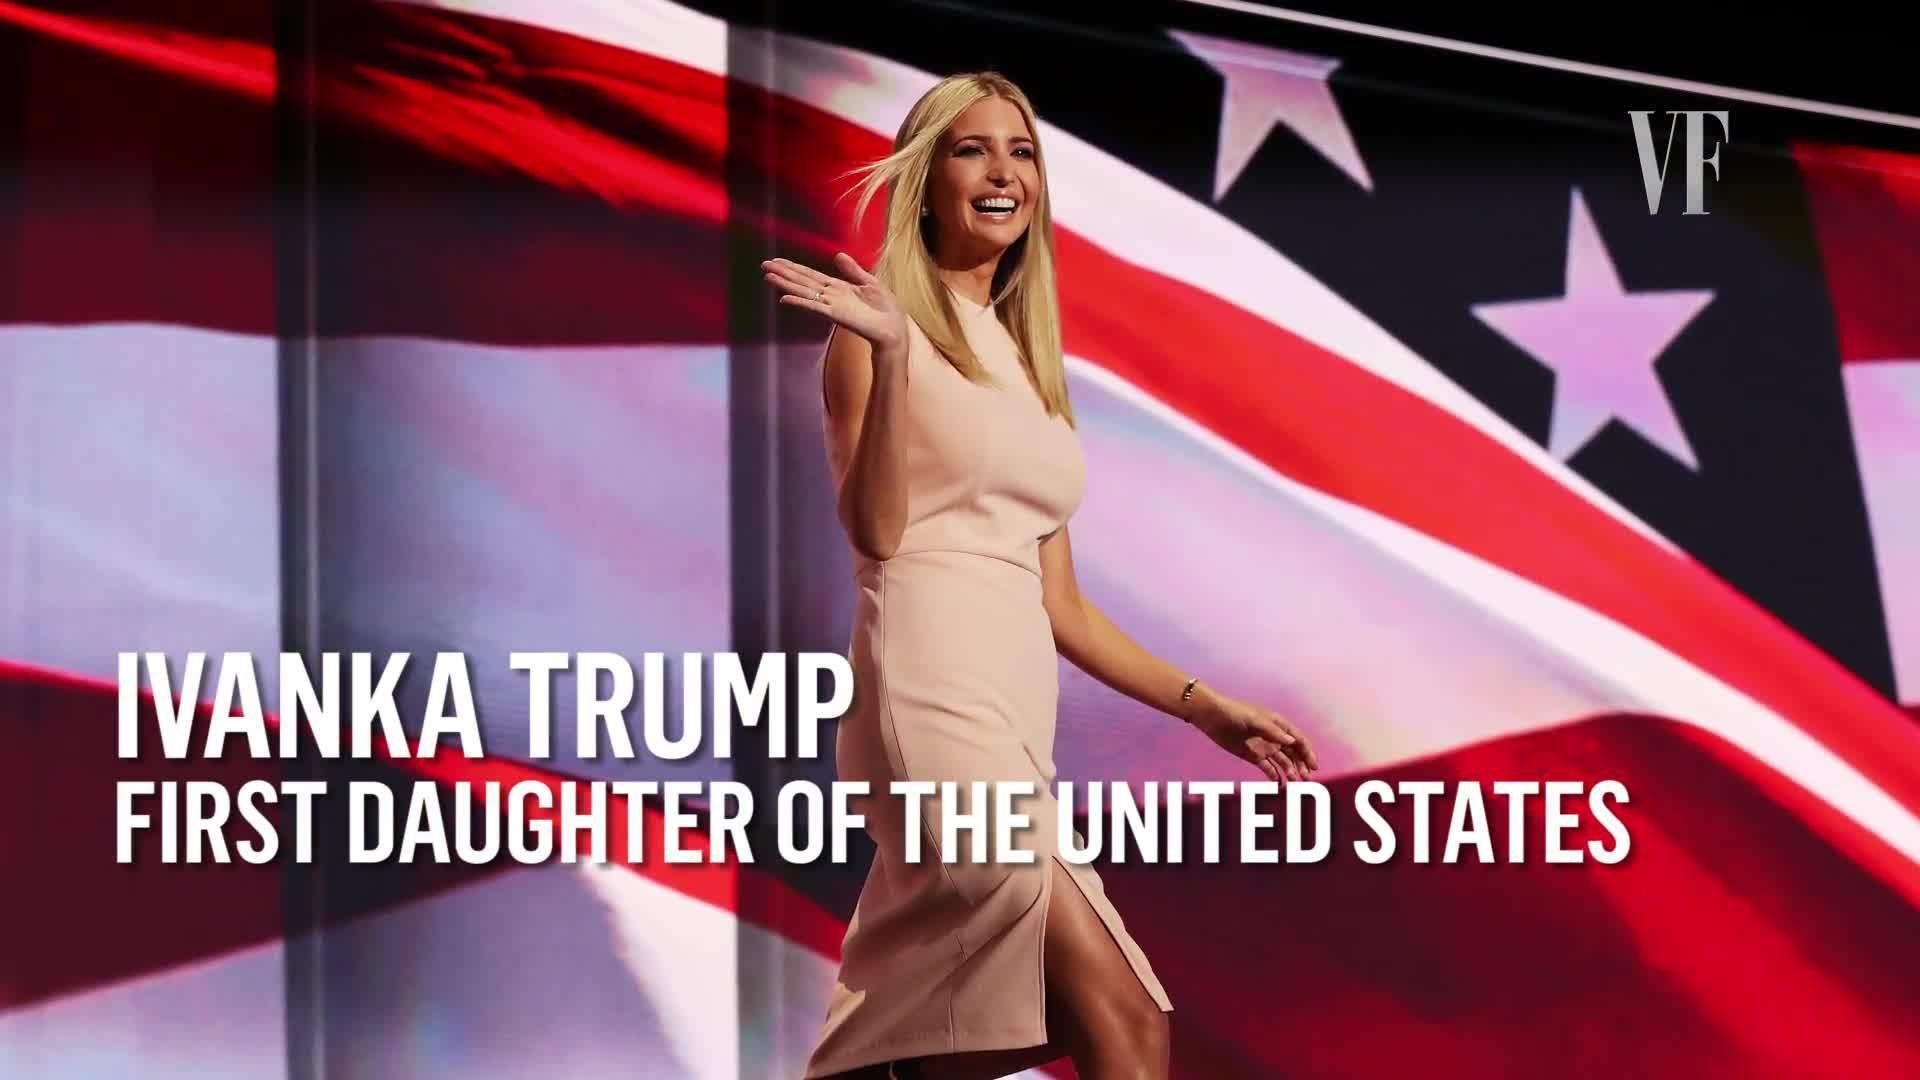 Ivanka Trump's real name isn't Ivanka